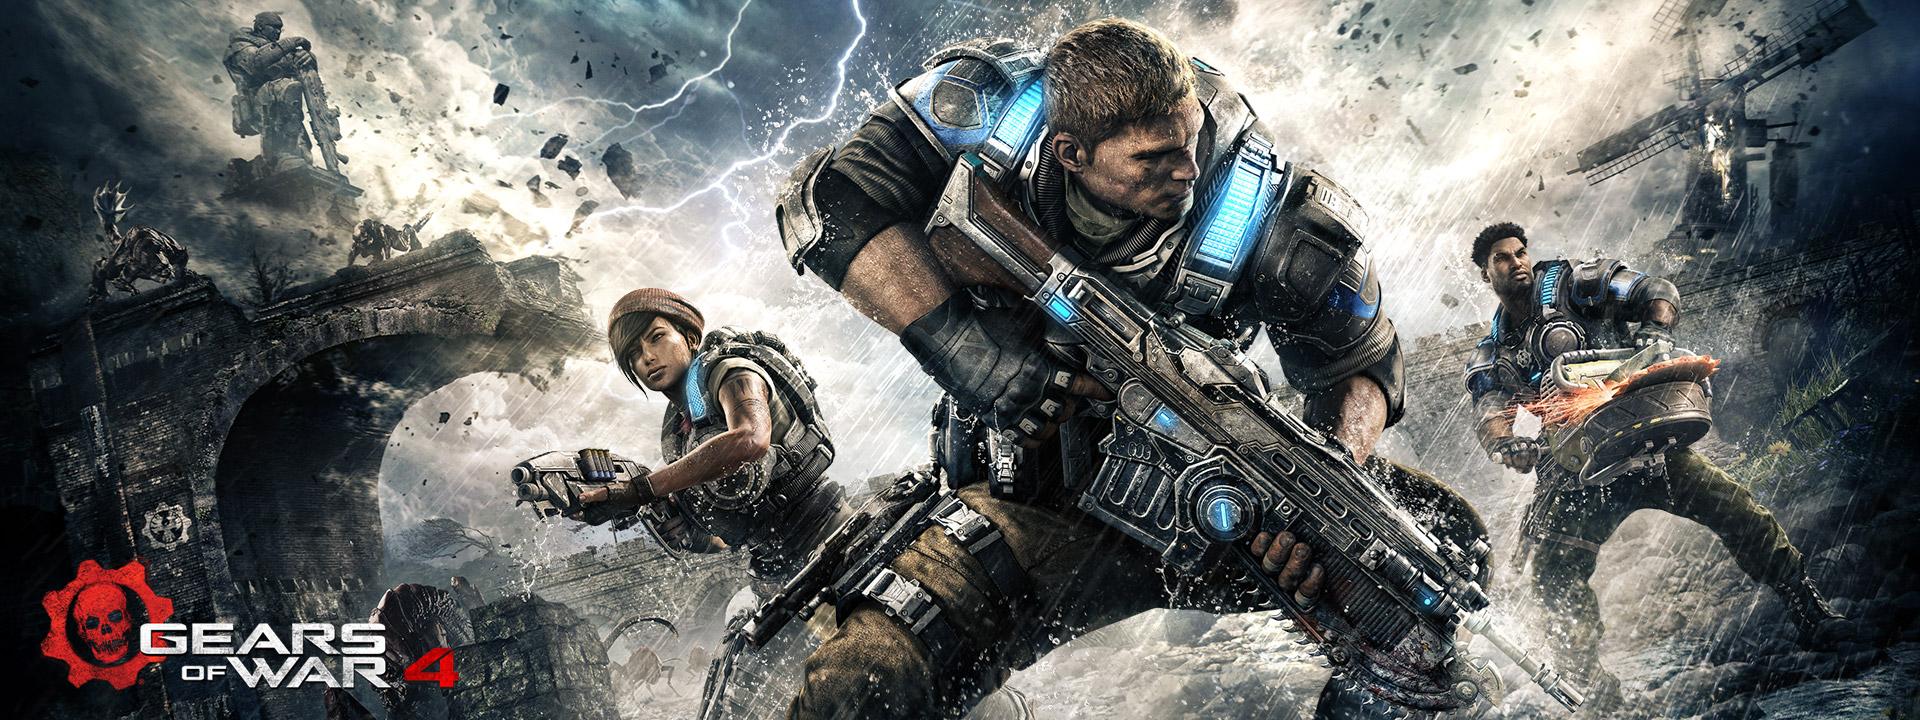 Gears of War 4 Titelbild